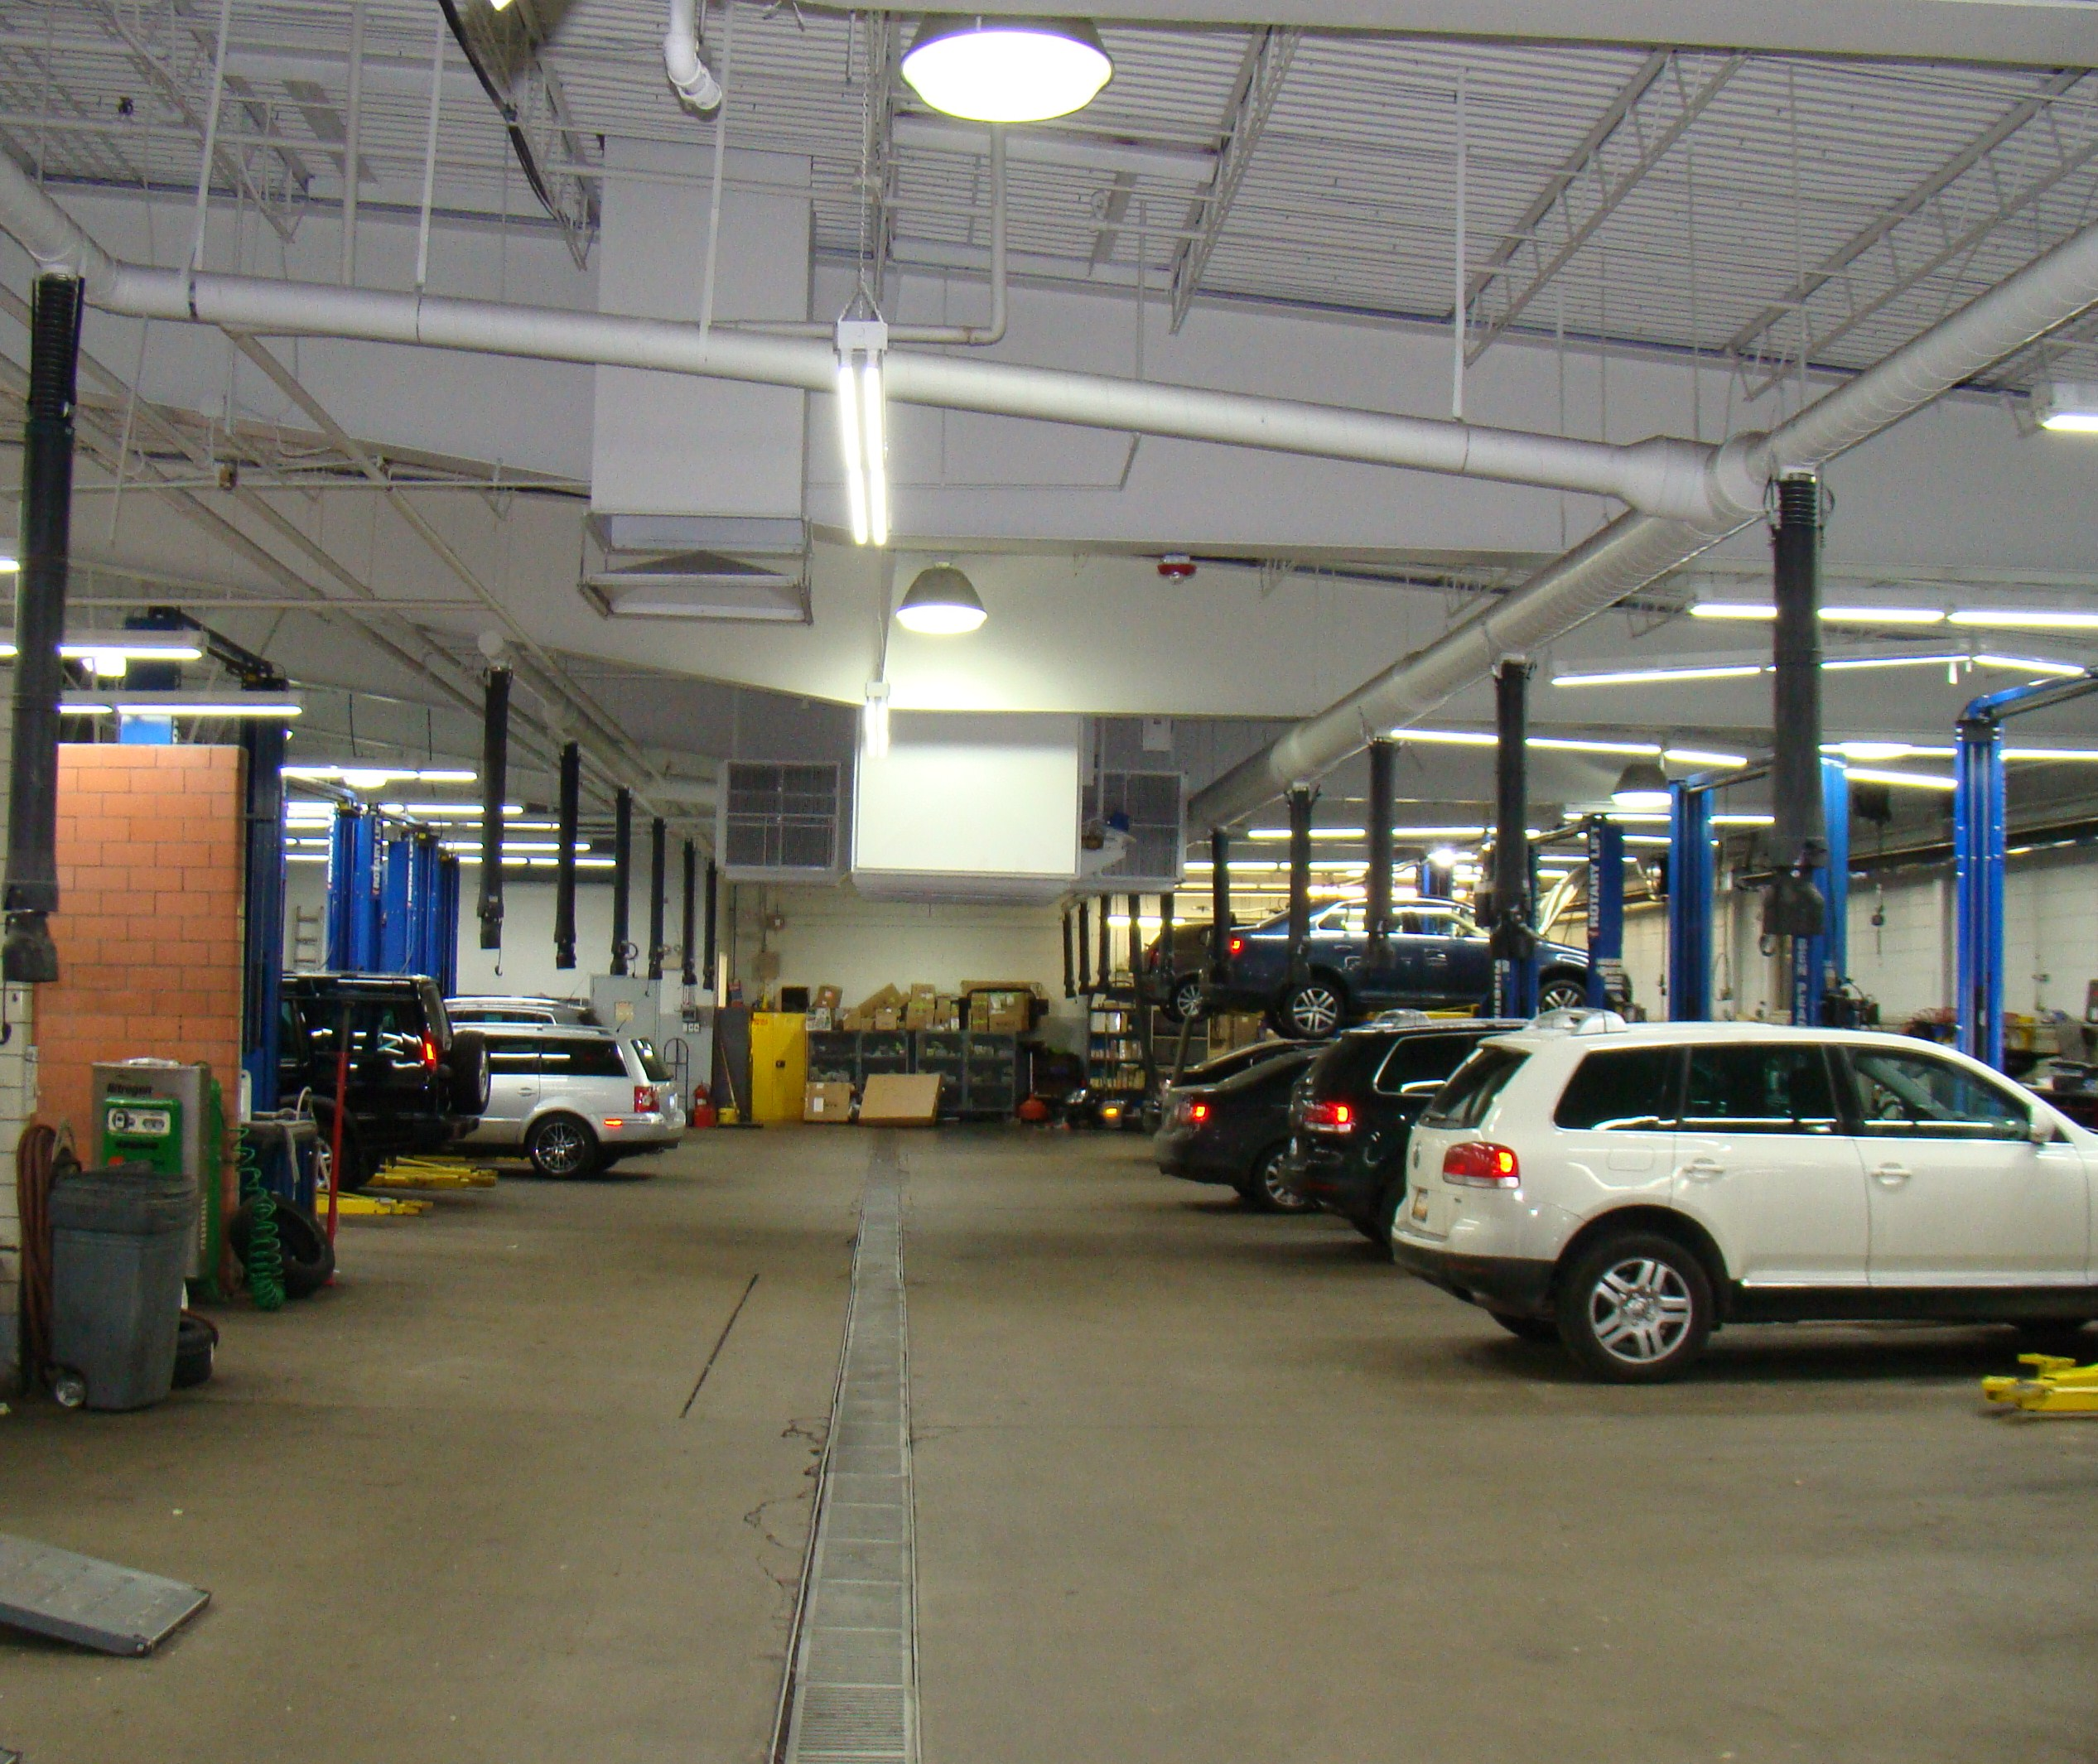 Emich Volkswagen Service Bay Led Lighting Retrofit